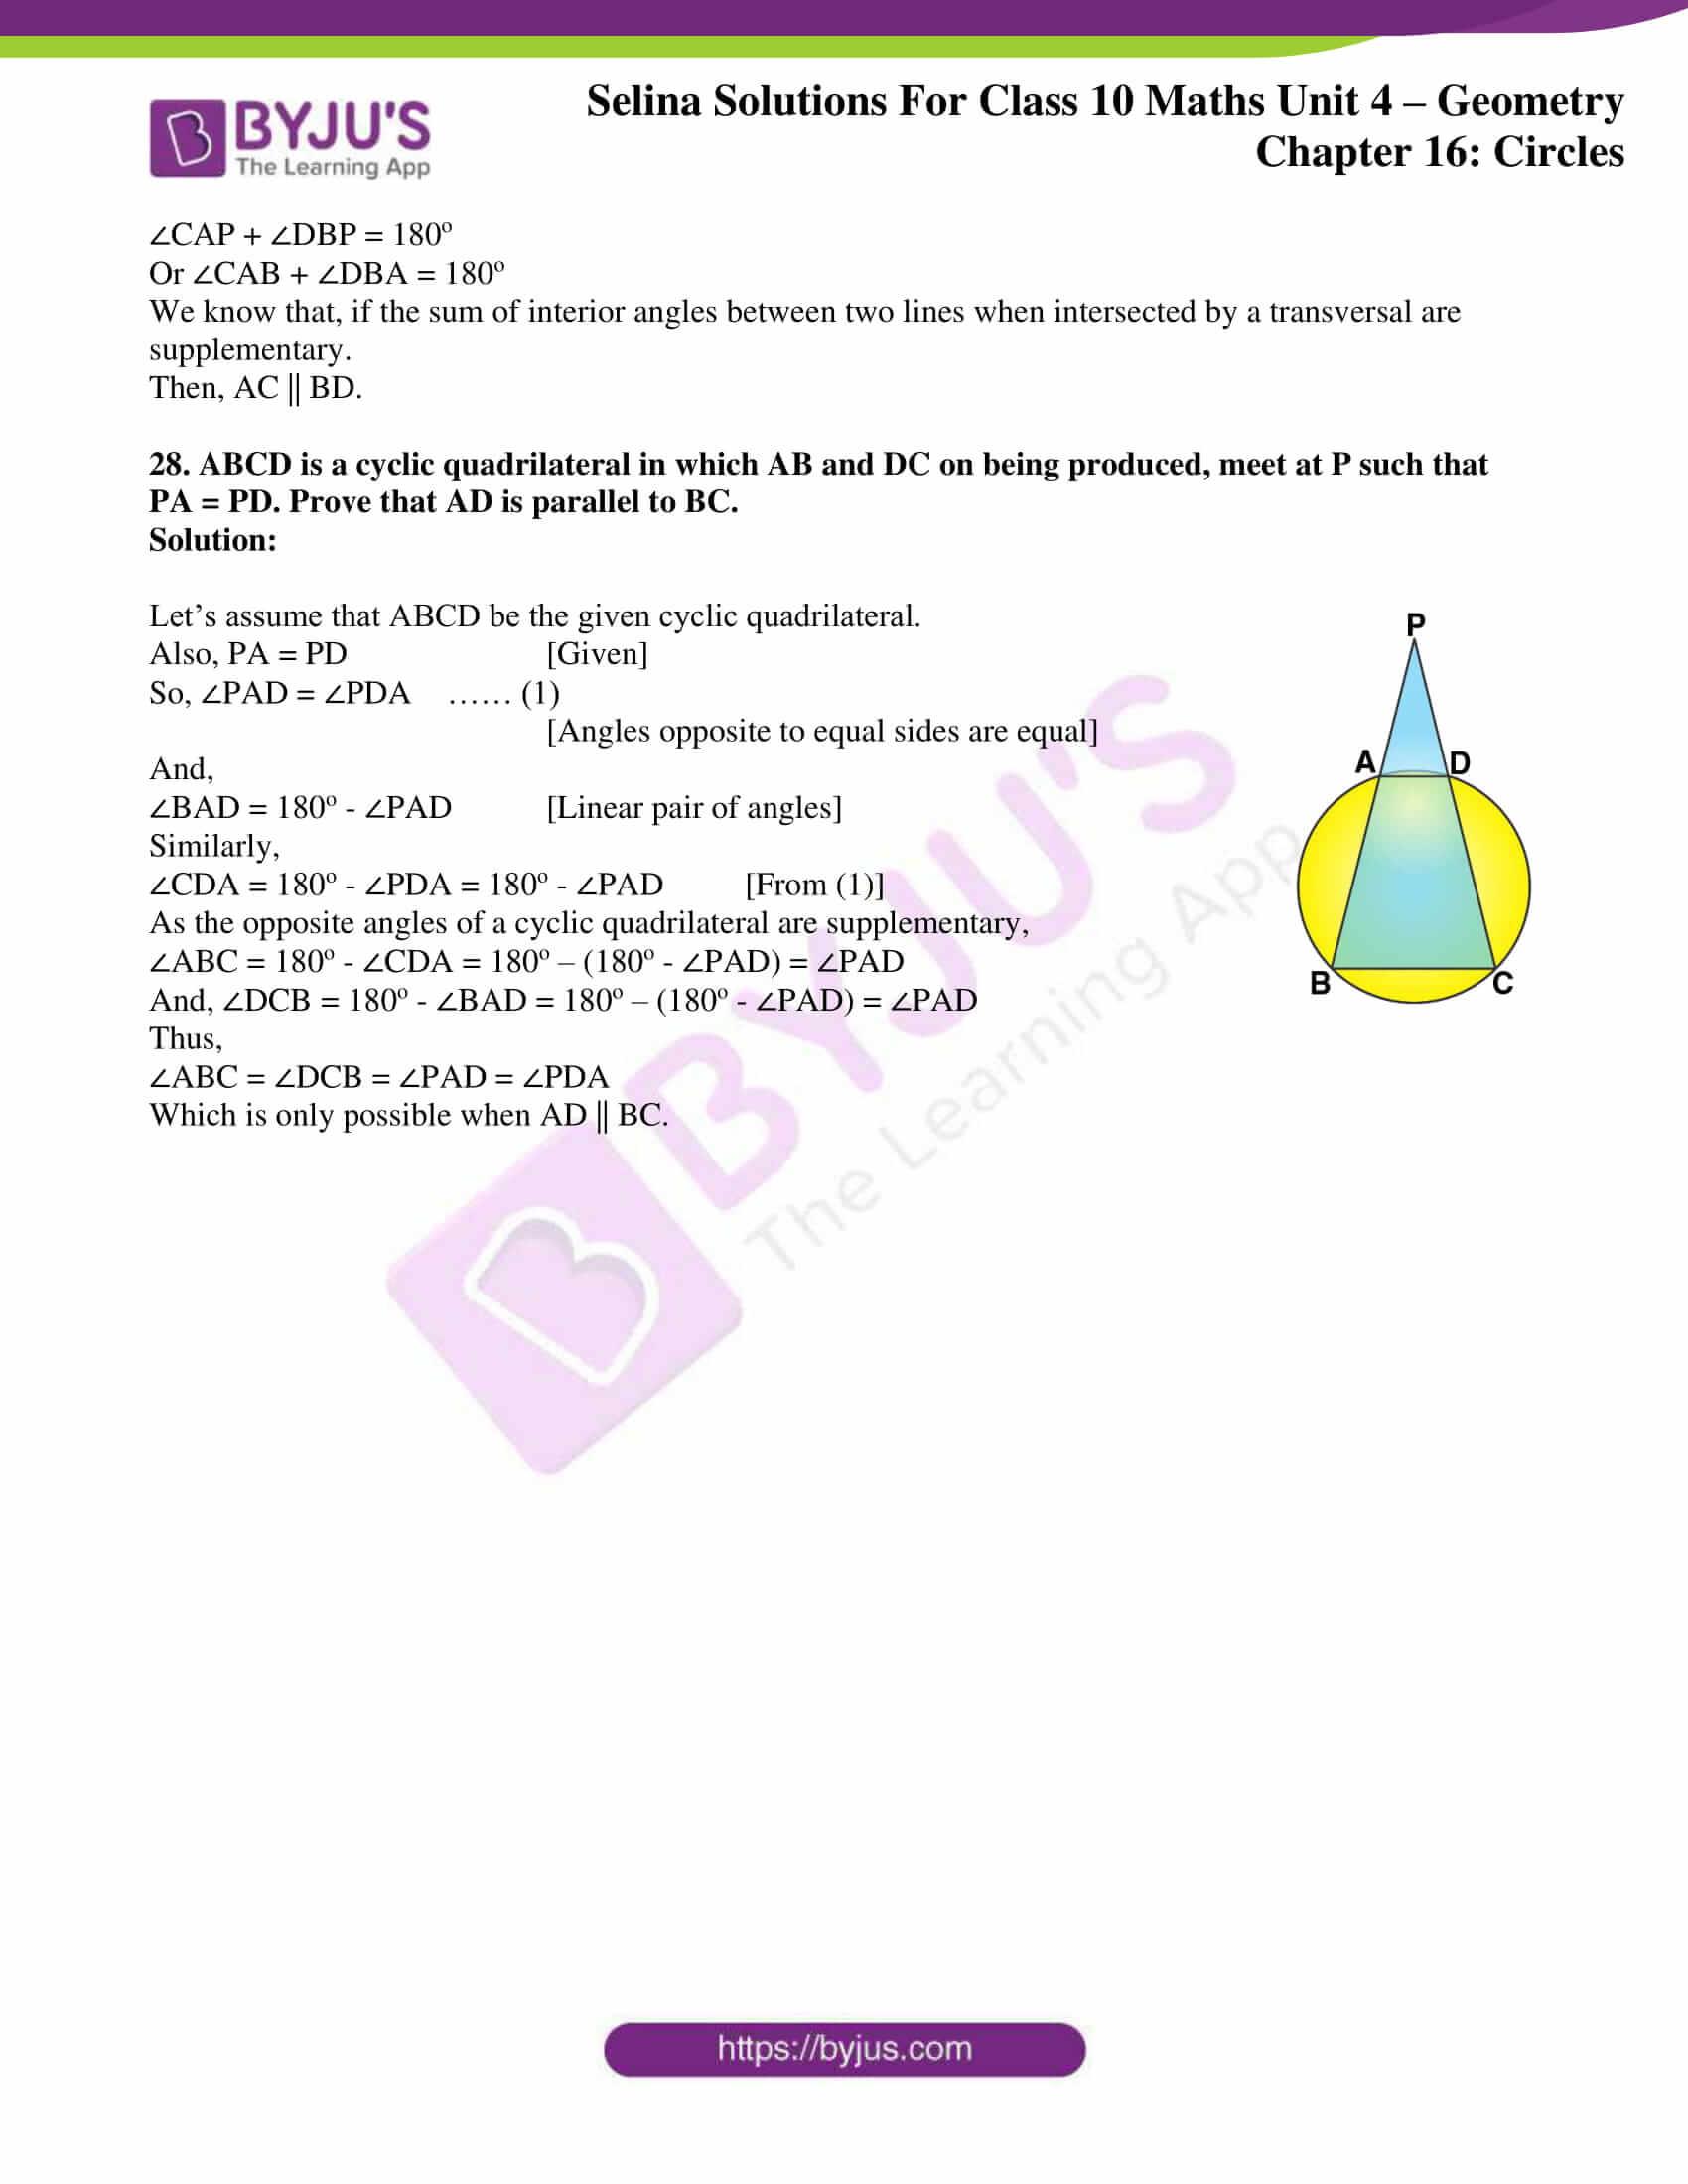 selina-sol-maths-class-10-ch-17-ex-a-16